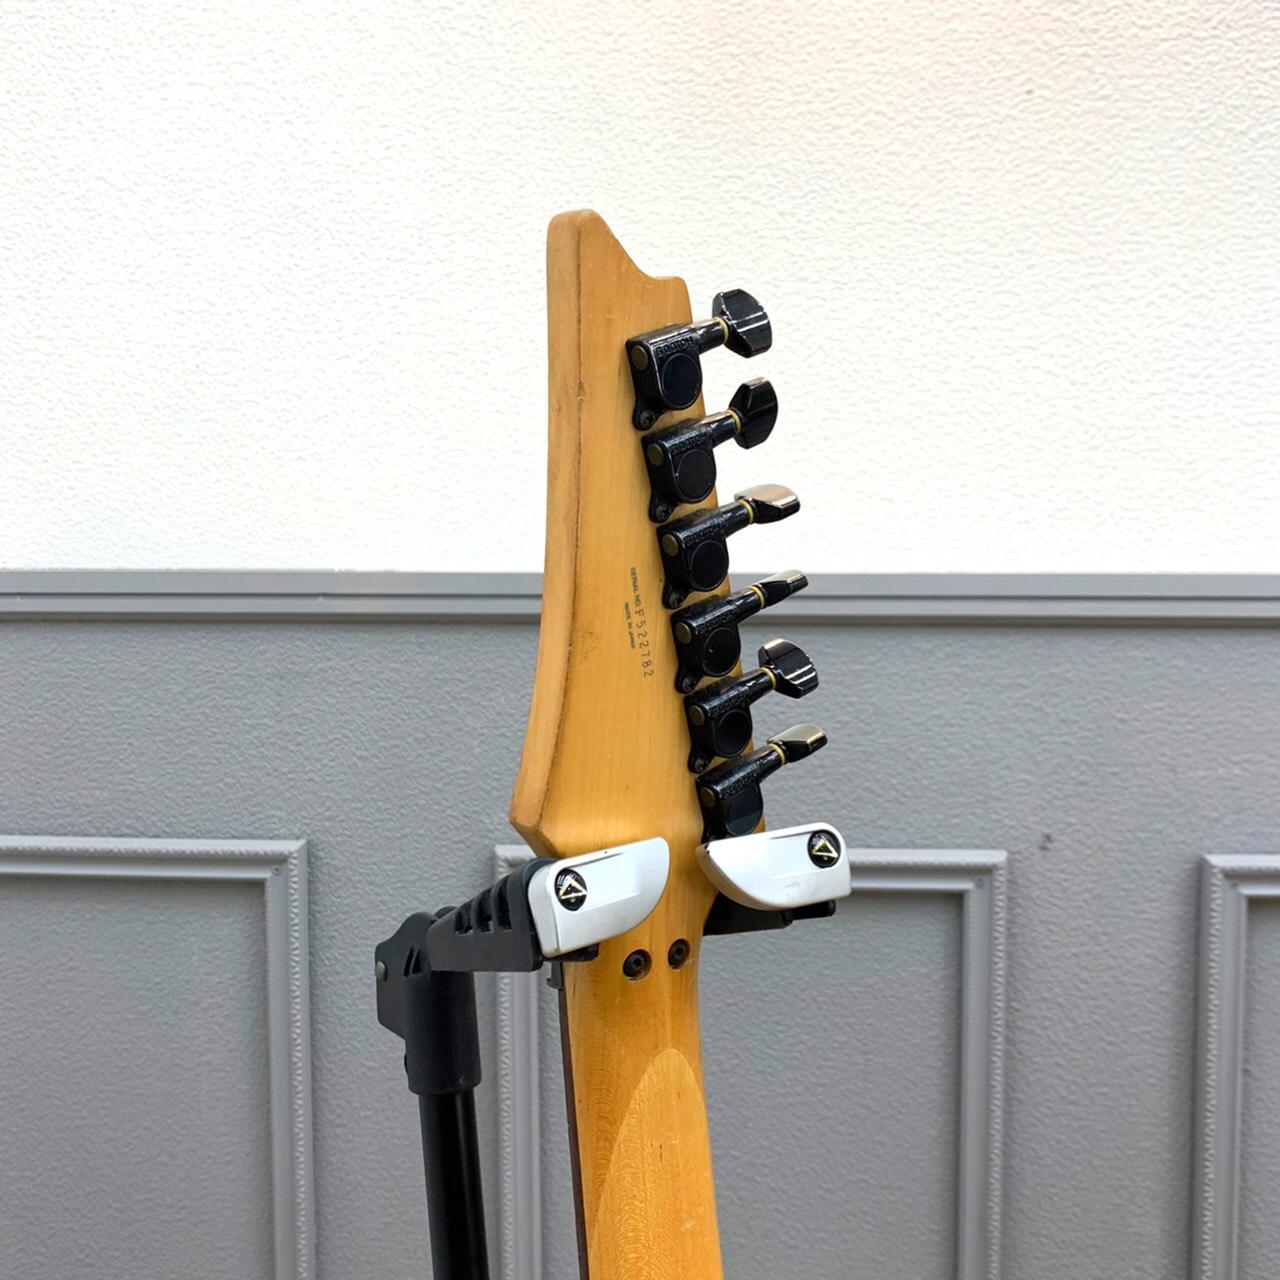 Ibanezアイバニーズ S370 エレキギター 1995年製造 国産 フジゲン オールマホガニーボディ3